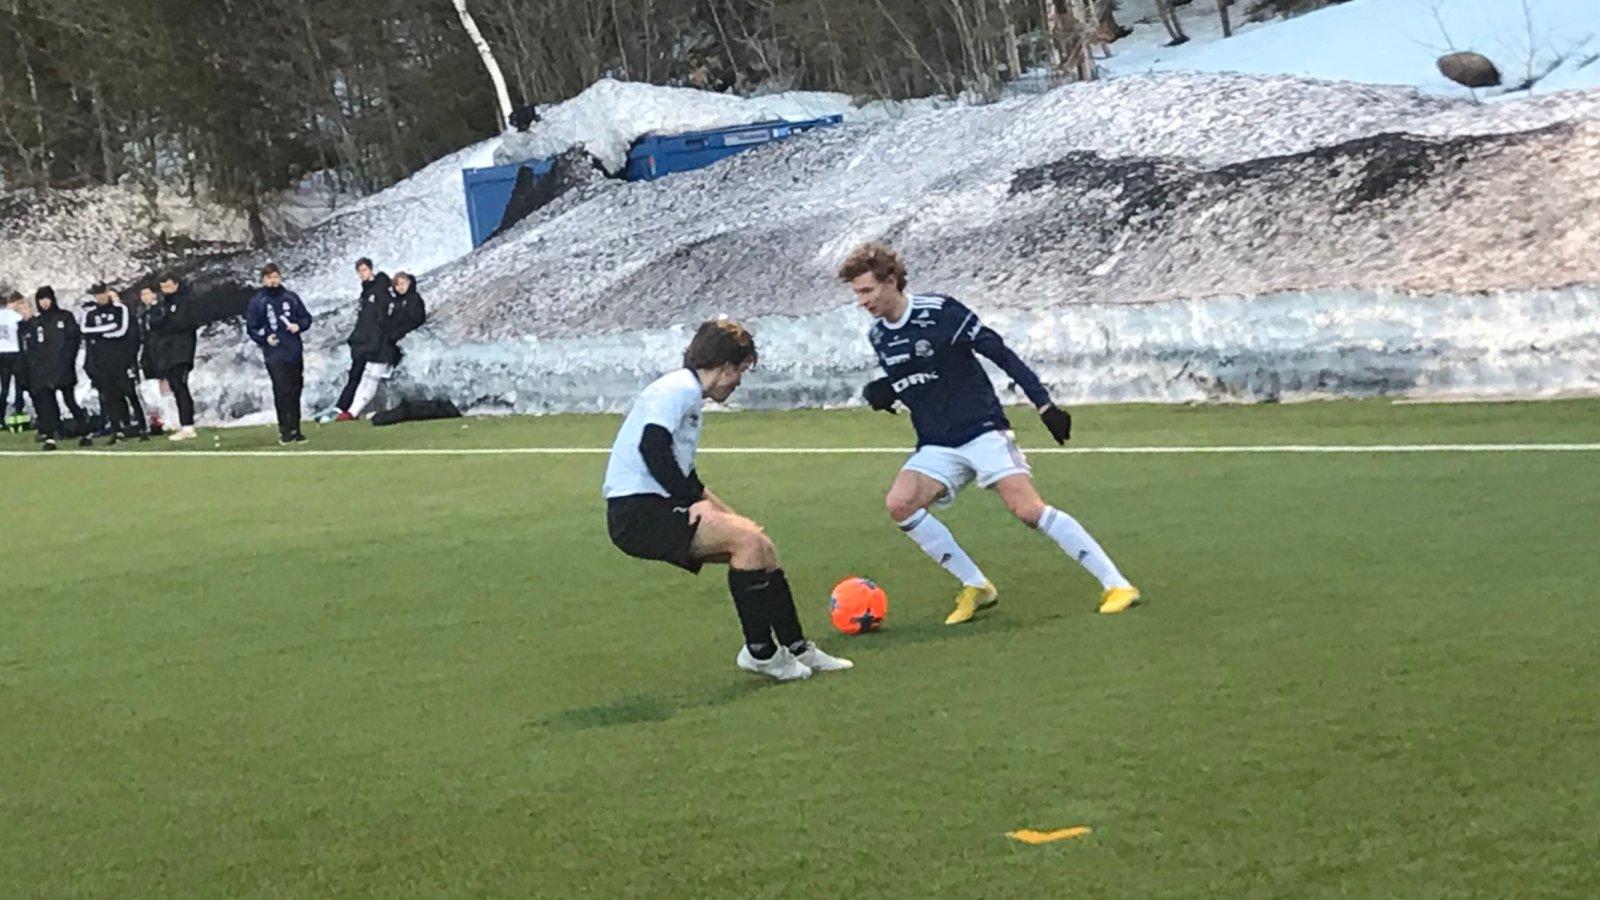 Historisk da Arendal G19 møtte Grane G19 til cup-kvalifisering.